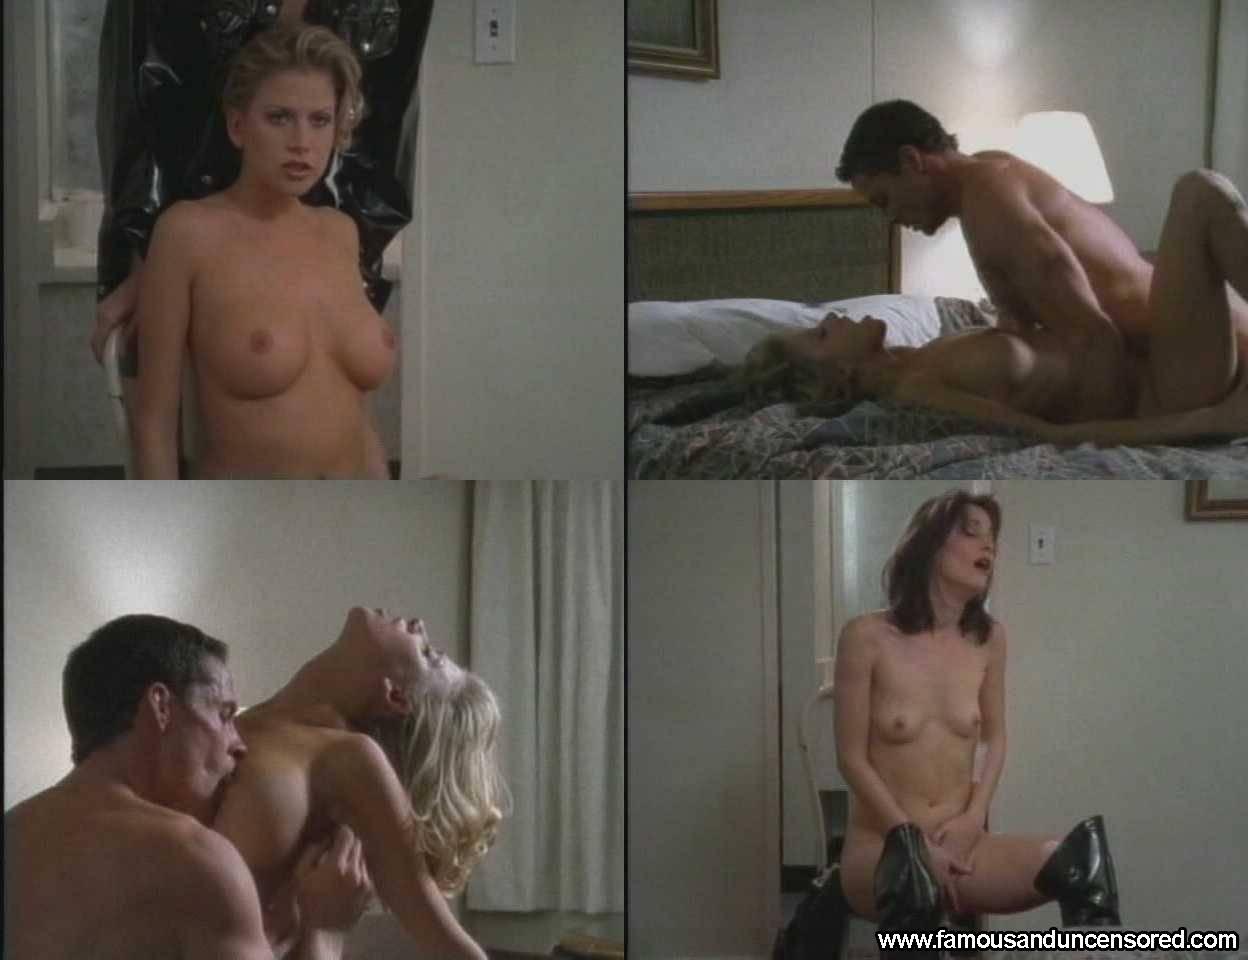 Evie delatosso porn actress 1